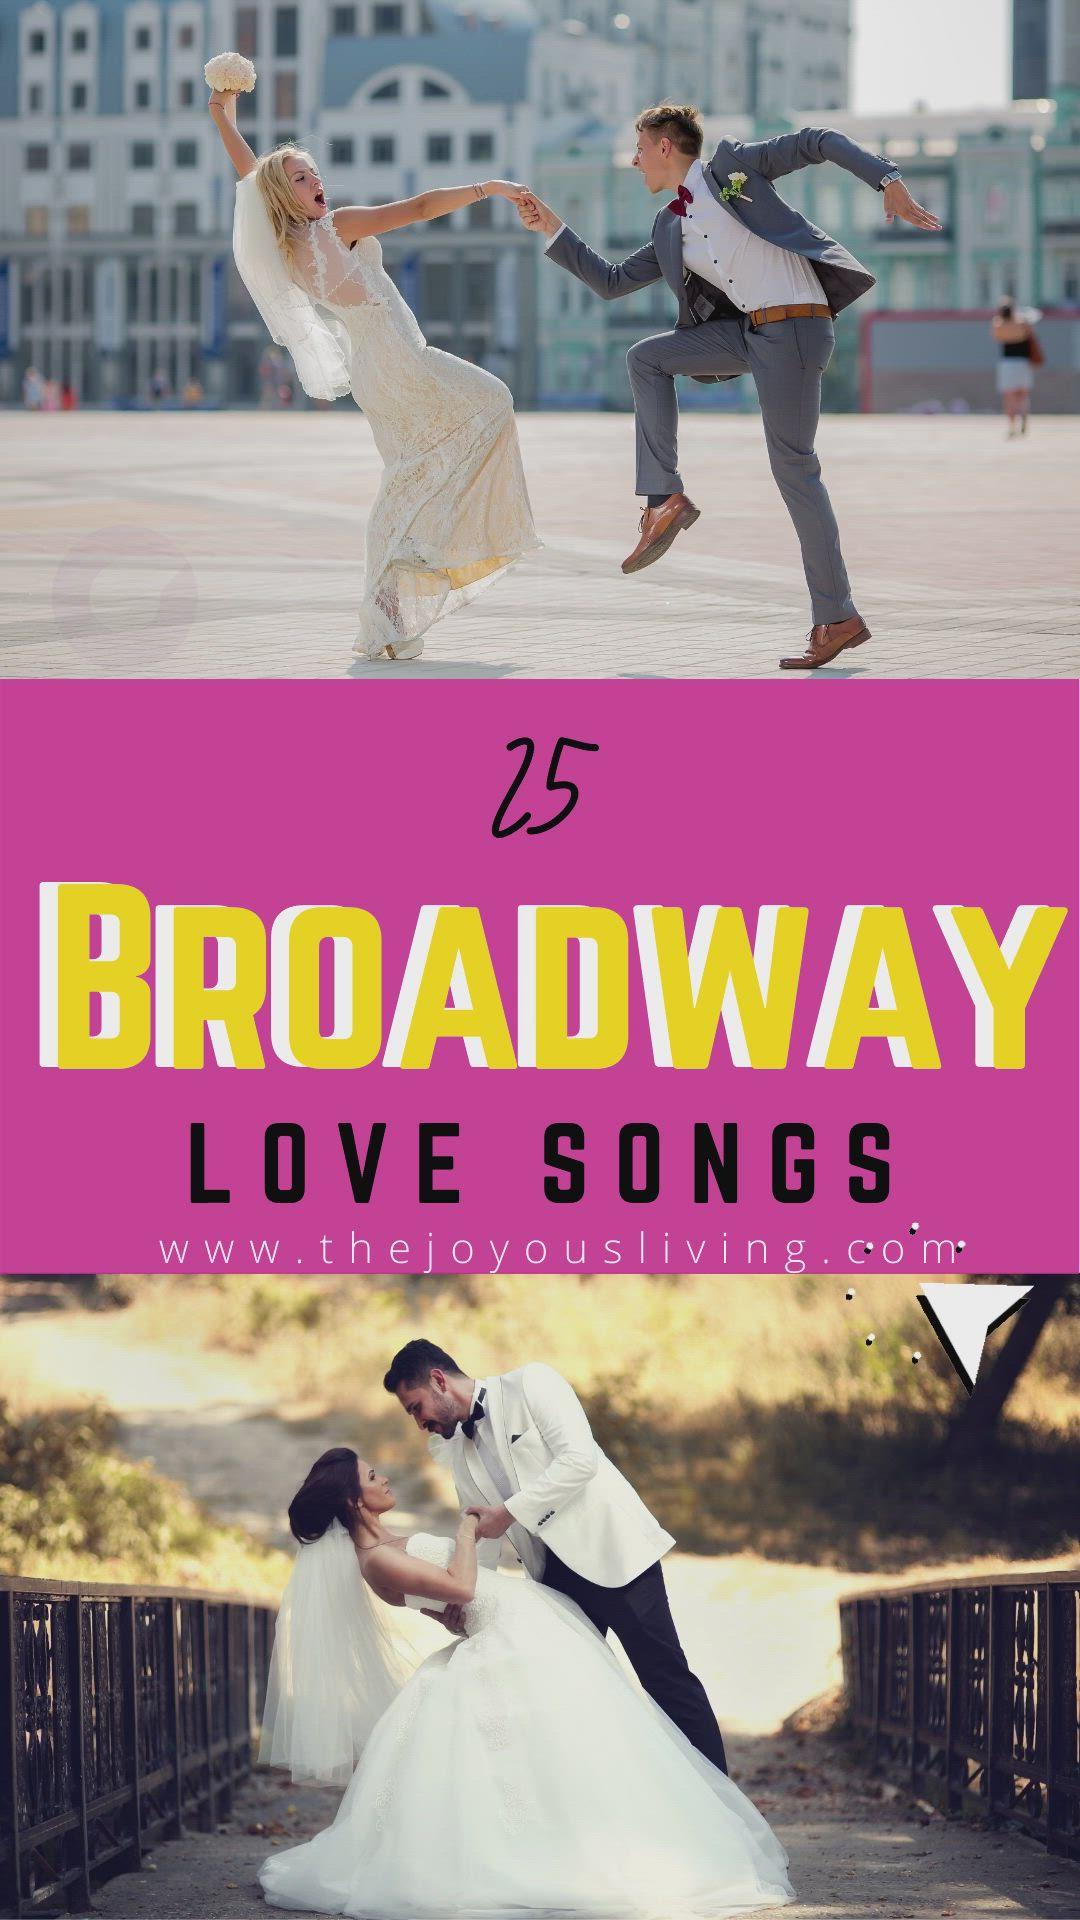 Wedding Songs Broadway Playlist Of 25 Love Songs Video In 2021 Broadway Songs Love Songs Songs